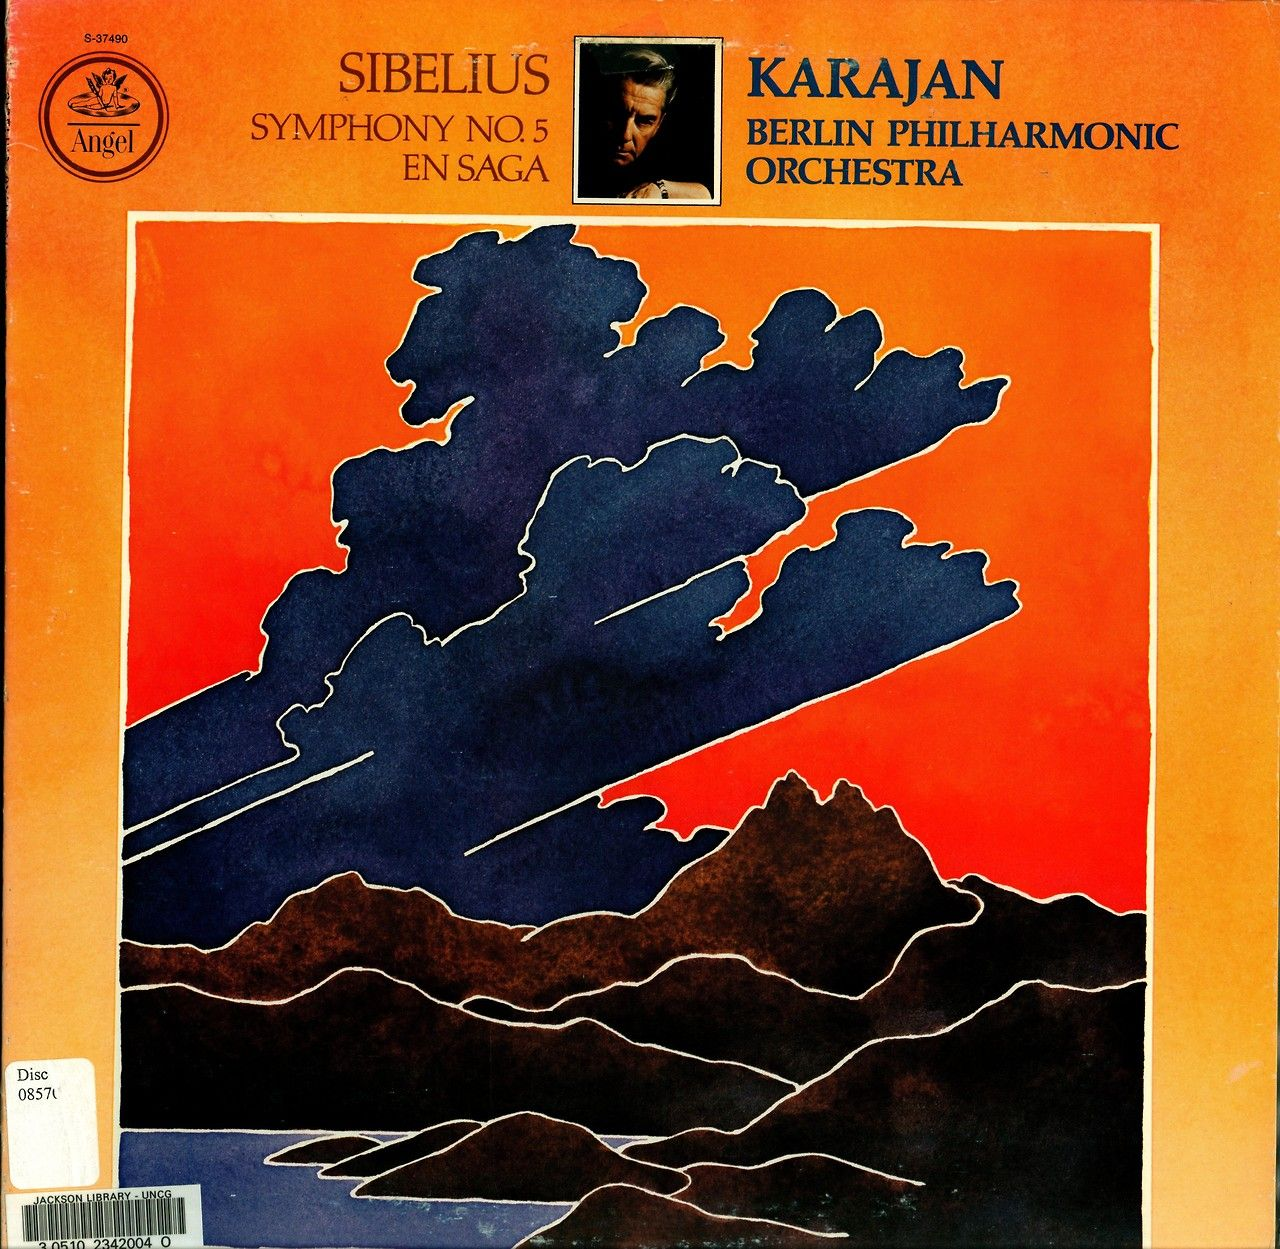 Sibelius- Symphony No. 5:En Saga Berlin Philharmonic Orchestra Herbert von Karajan, cond.